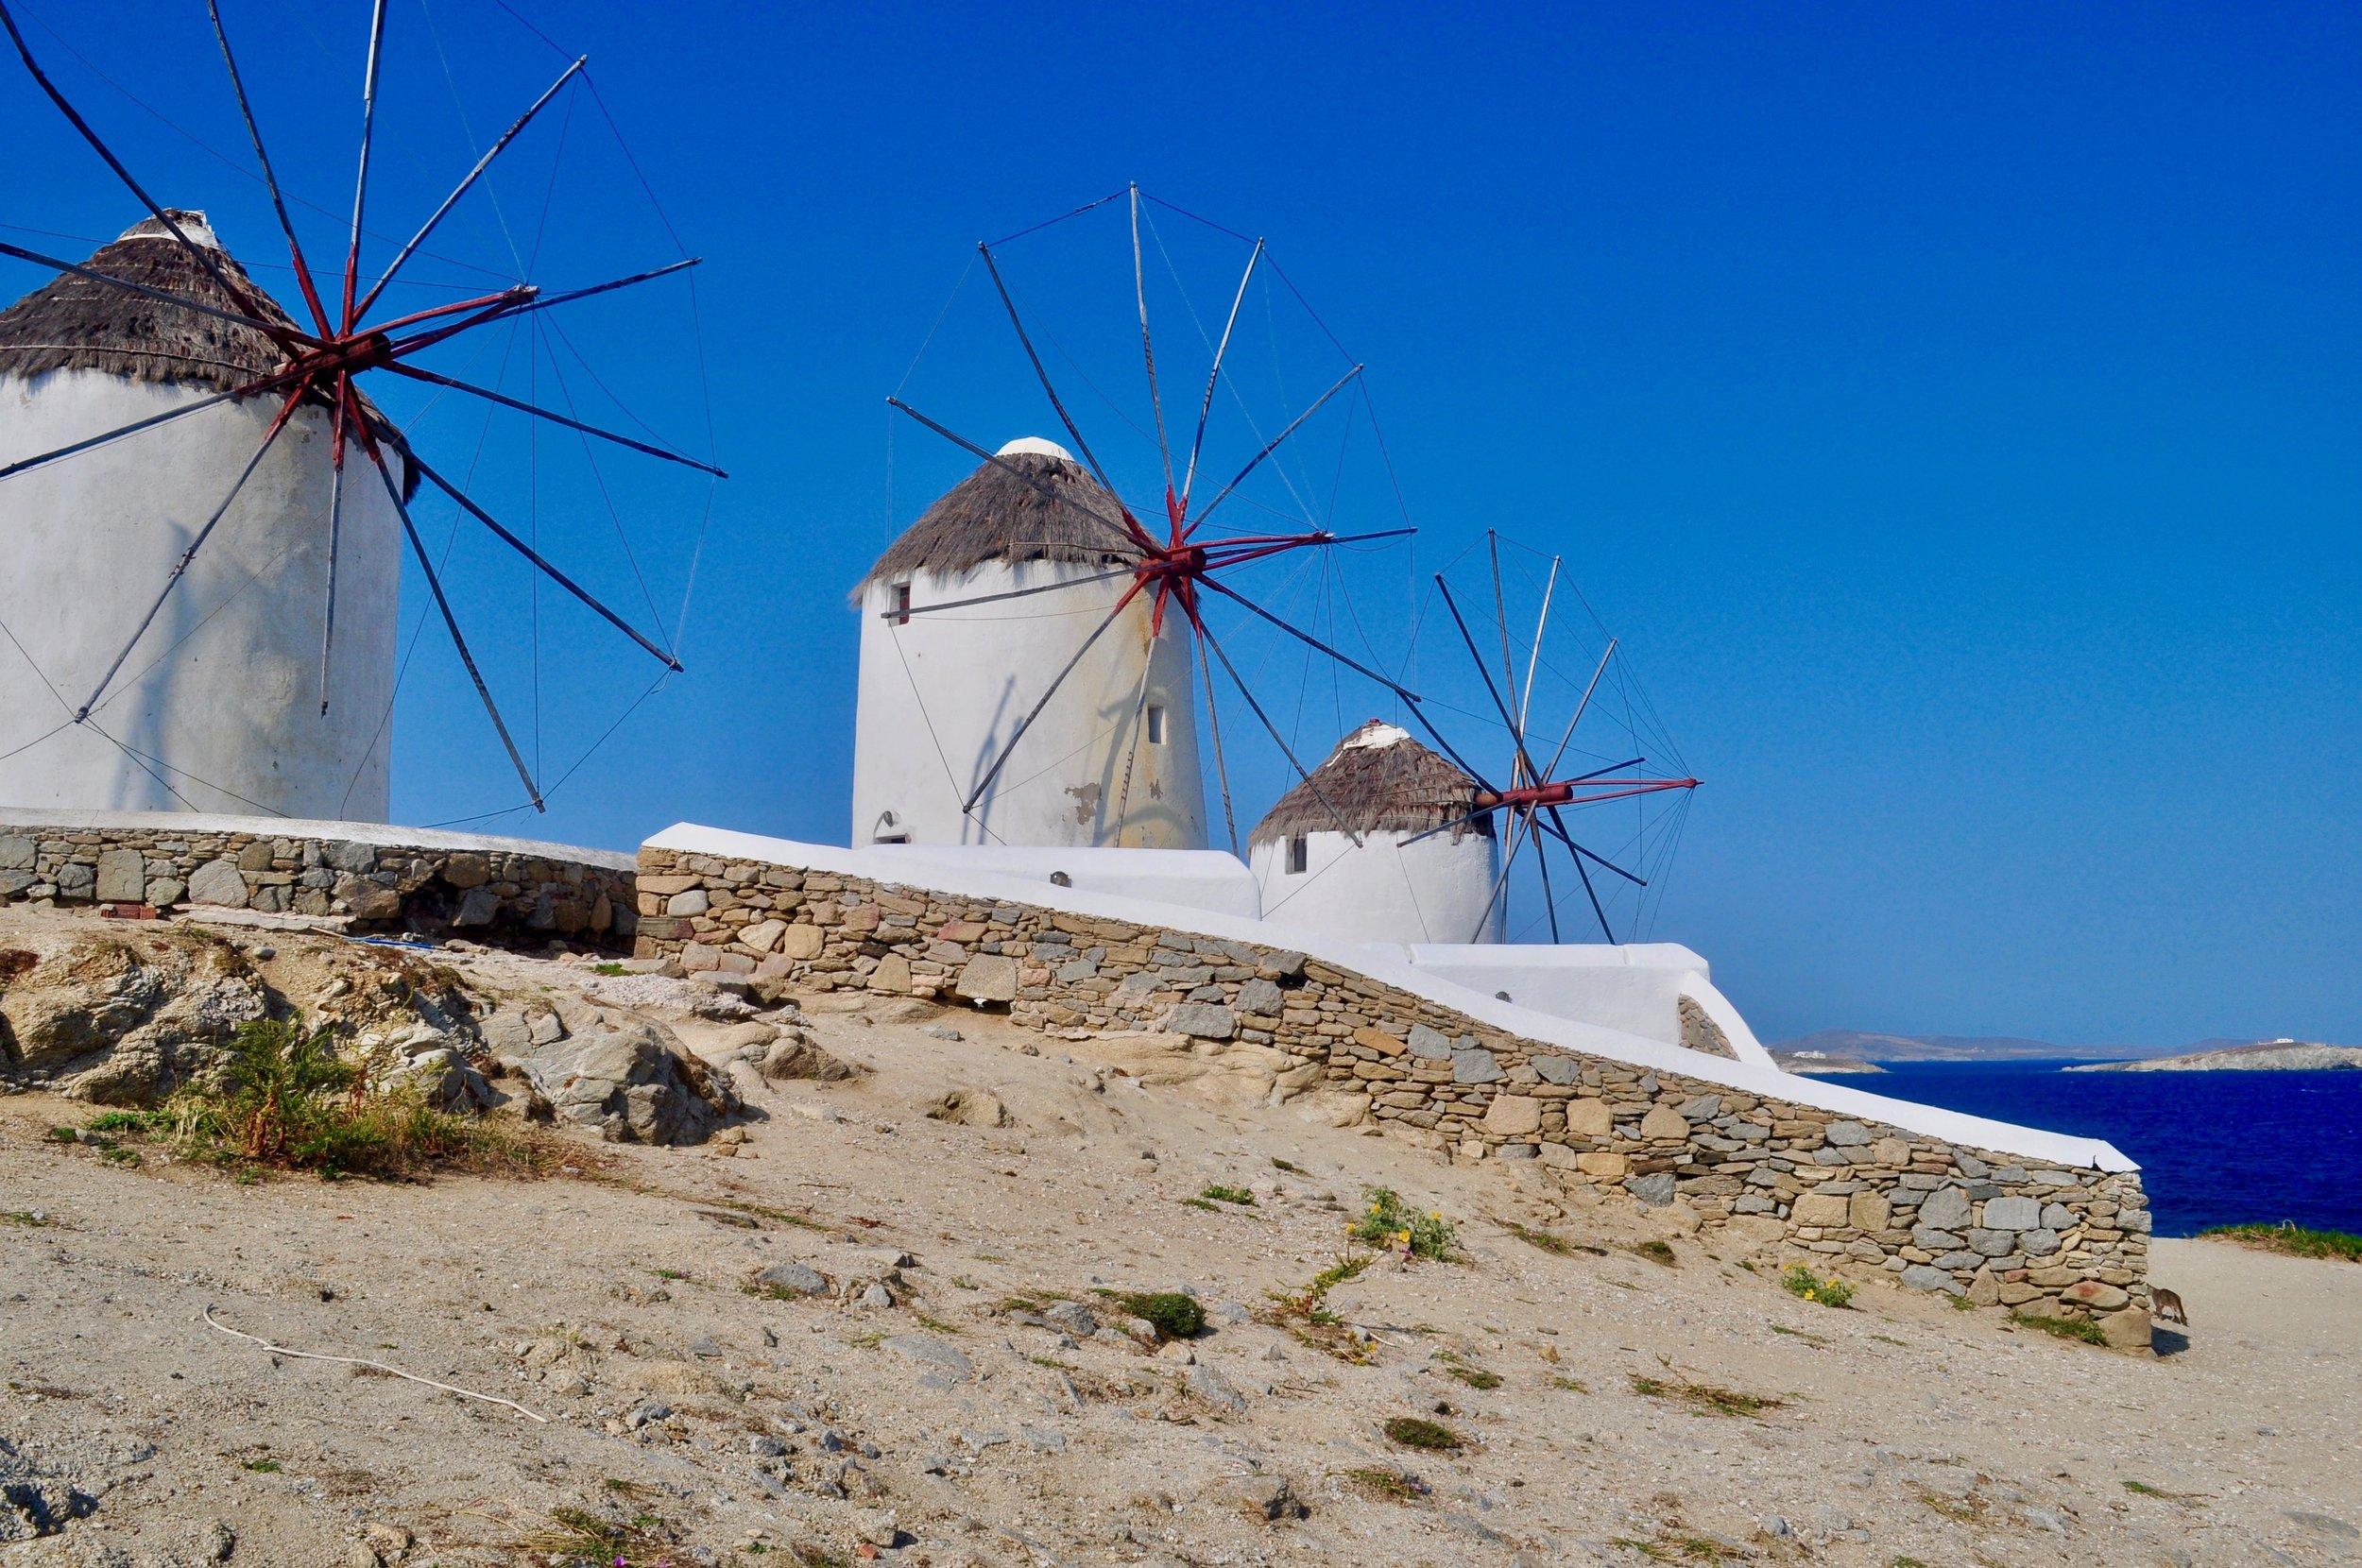 Exploring the Greek Isles on a Cruise - A Happy Passport #greece #mykonos #cruise